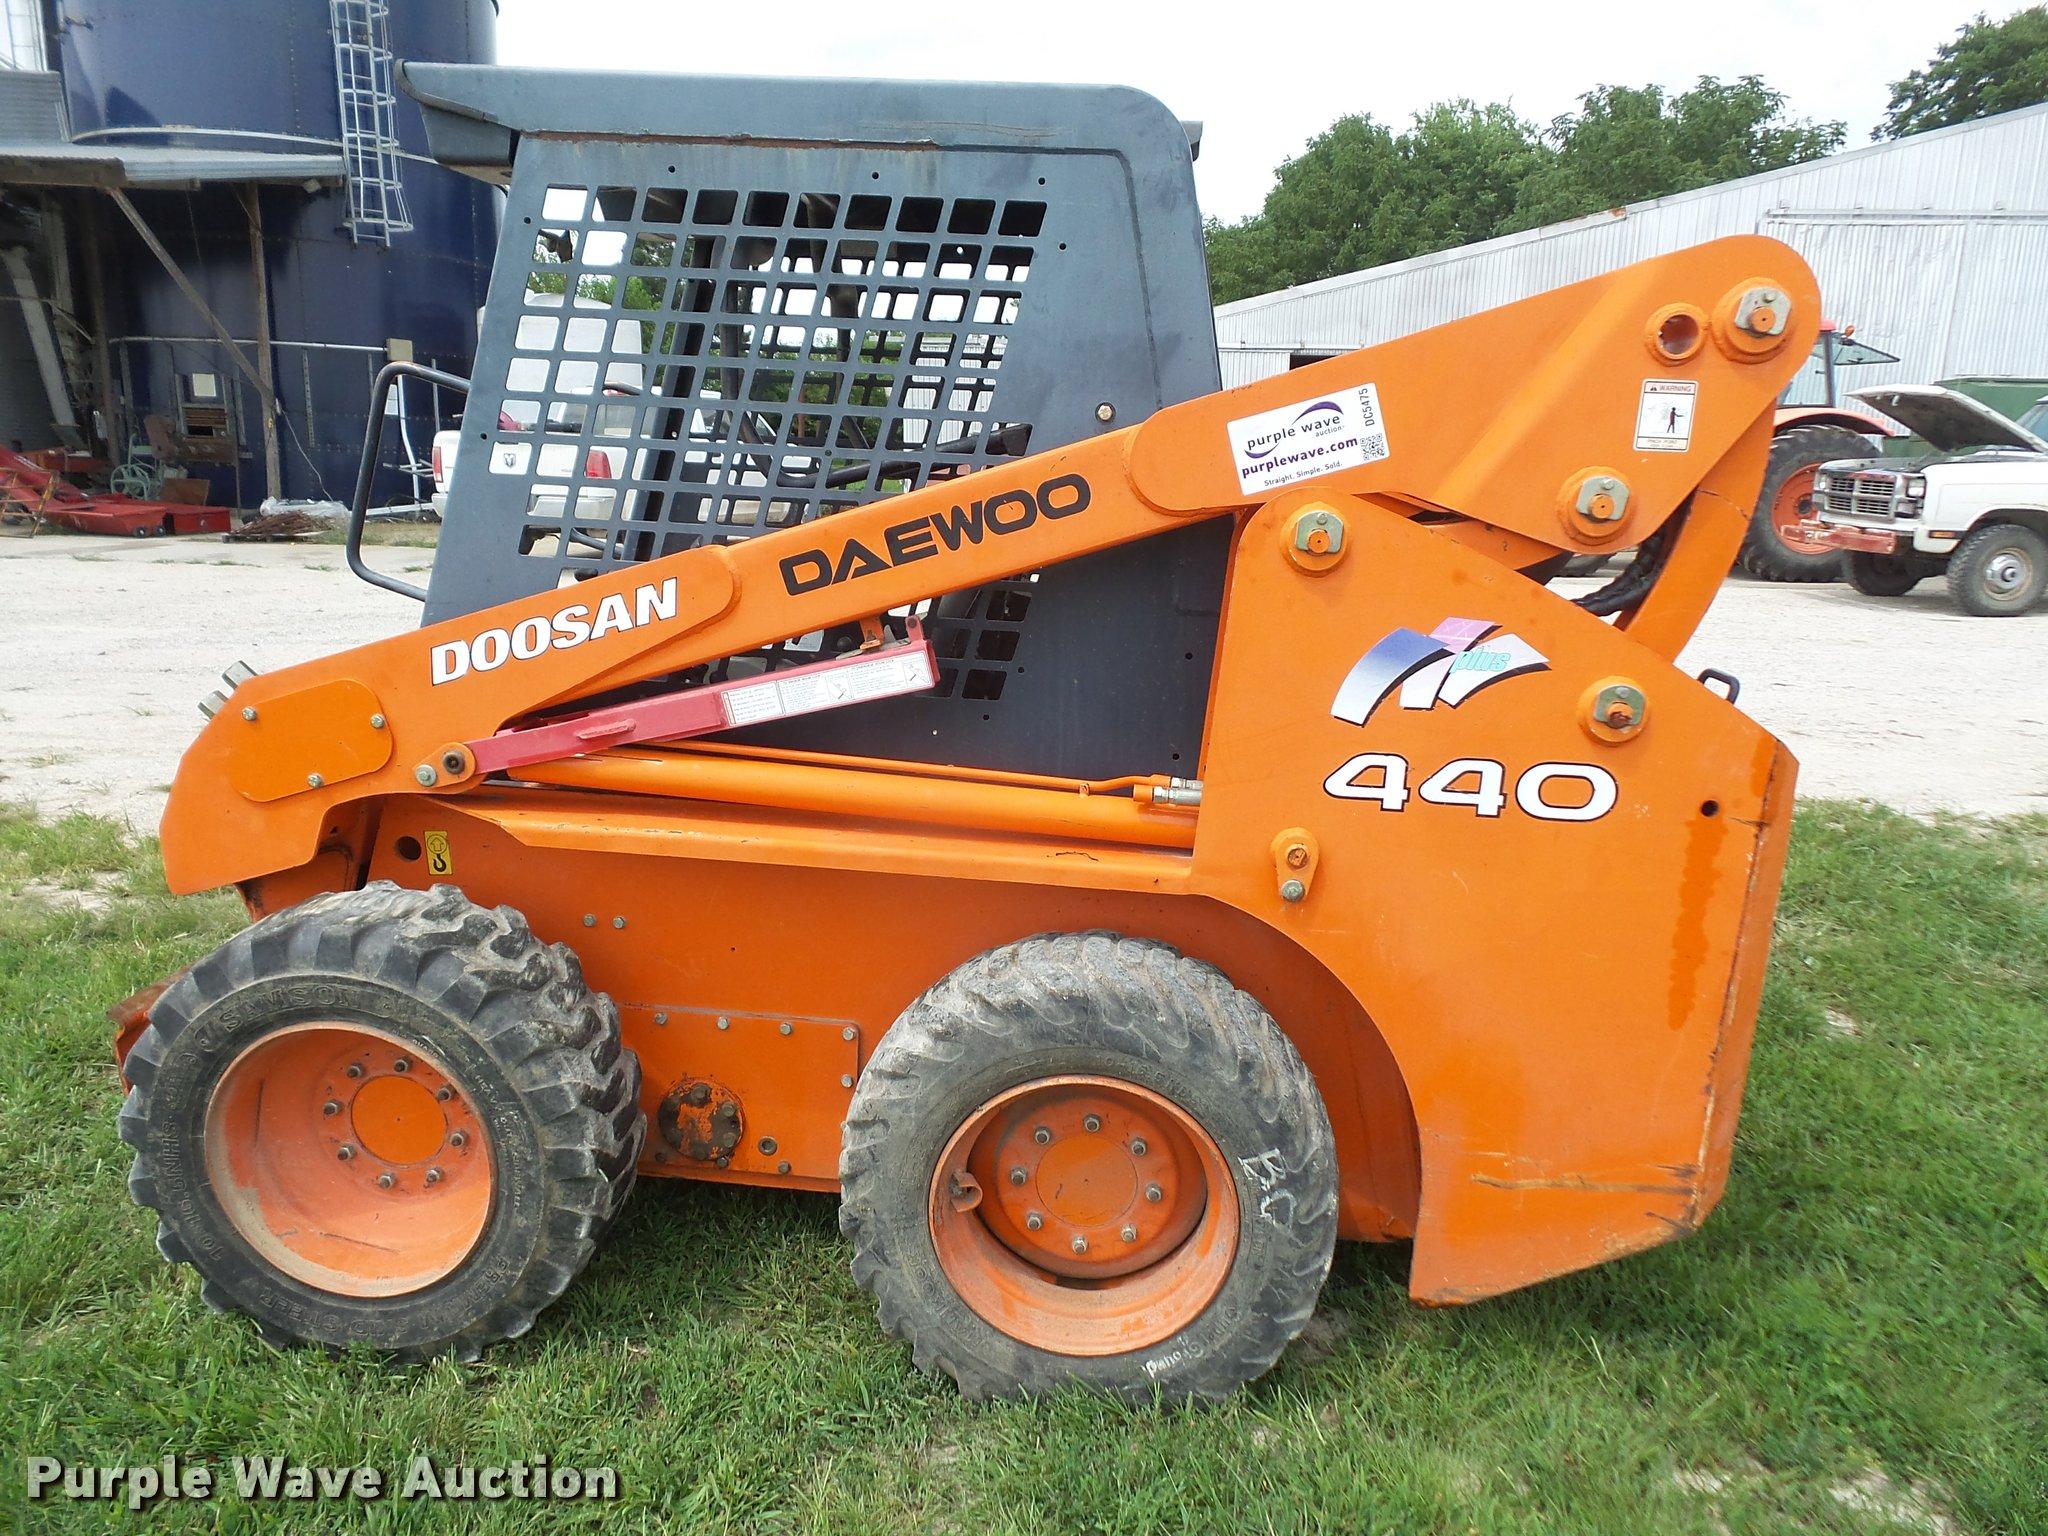 ... Daewoo 440 Plus skid steer Full size in new window ...